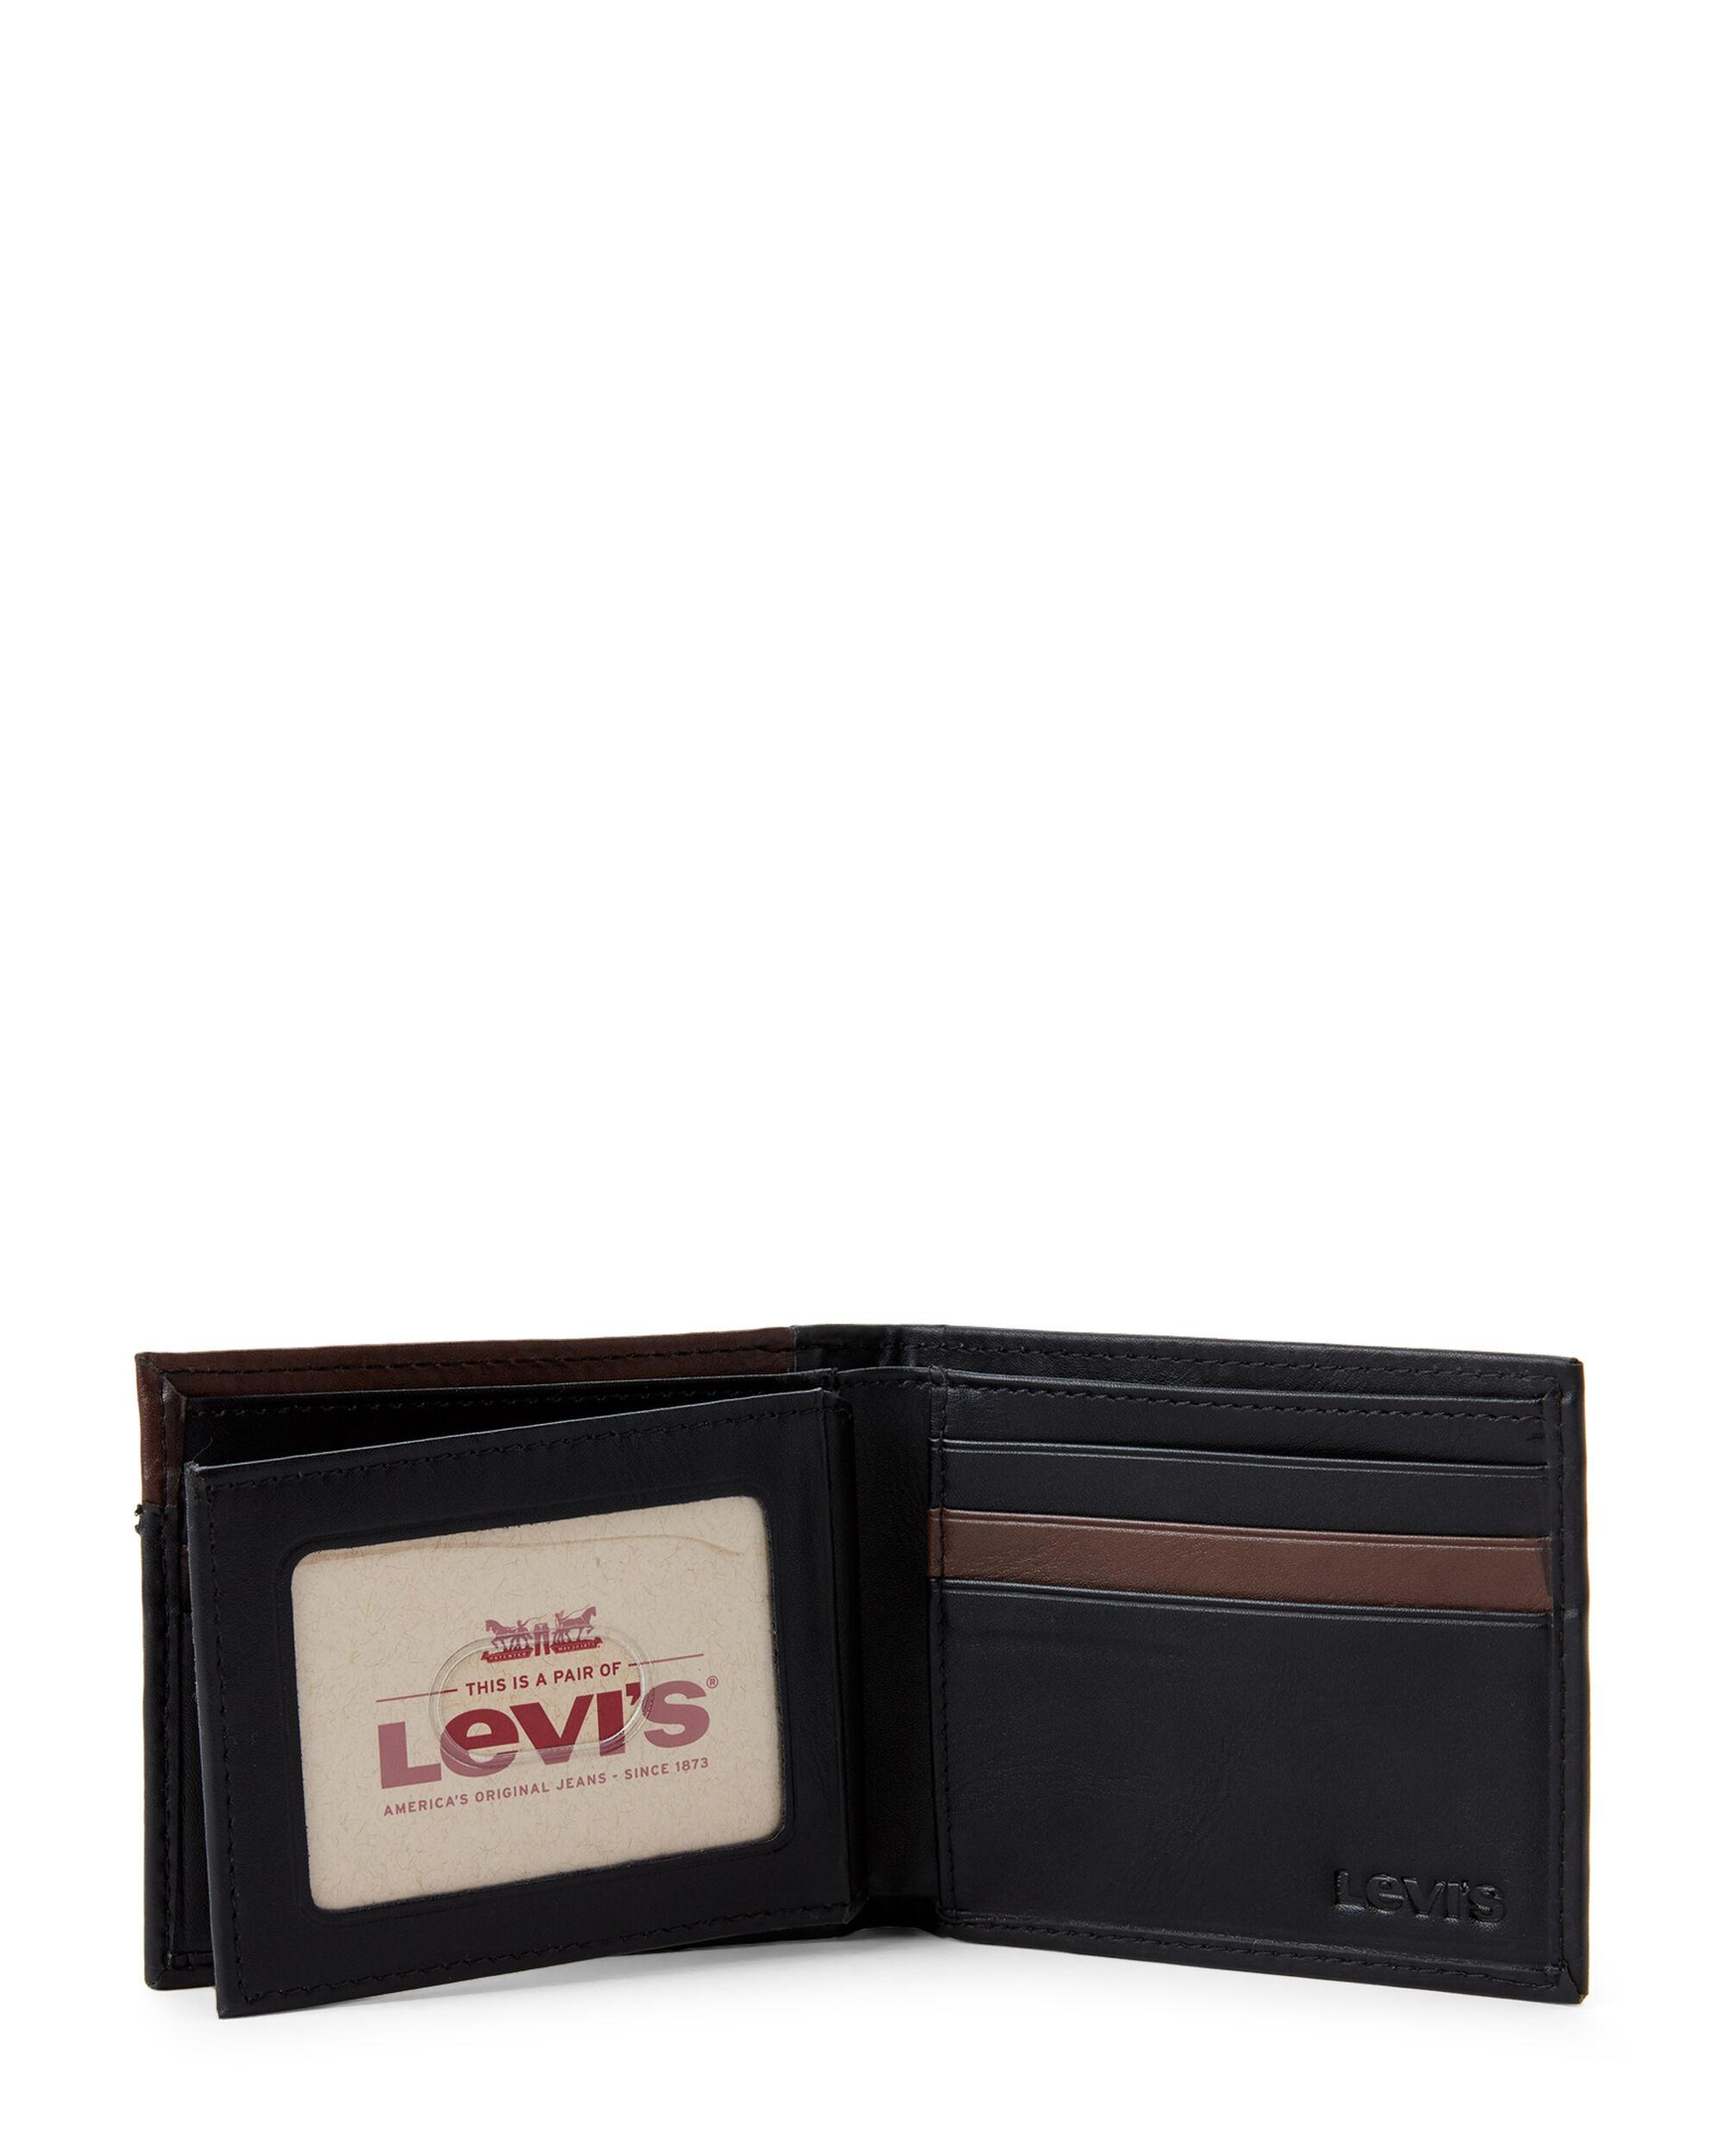 c262486ab Levi's Black Connor Rfid Slimfold Wallet for men. View fullscreen